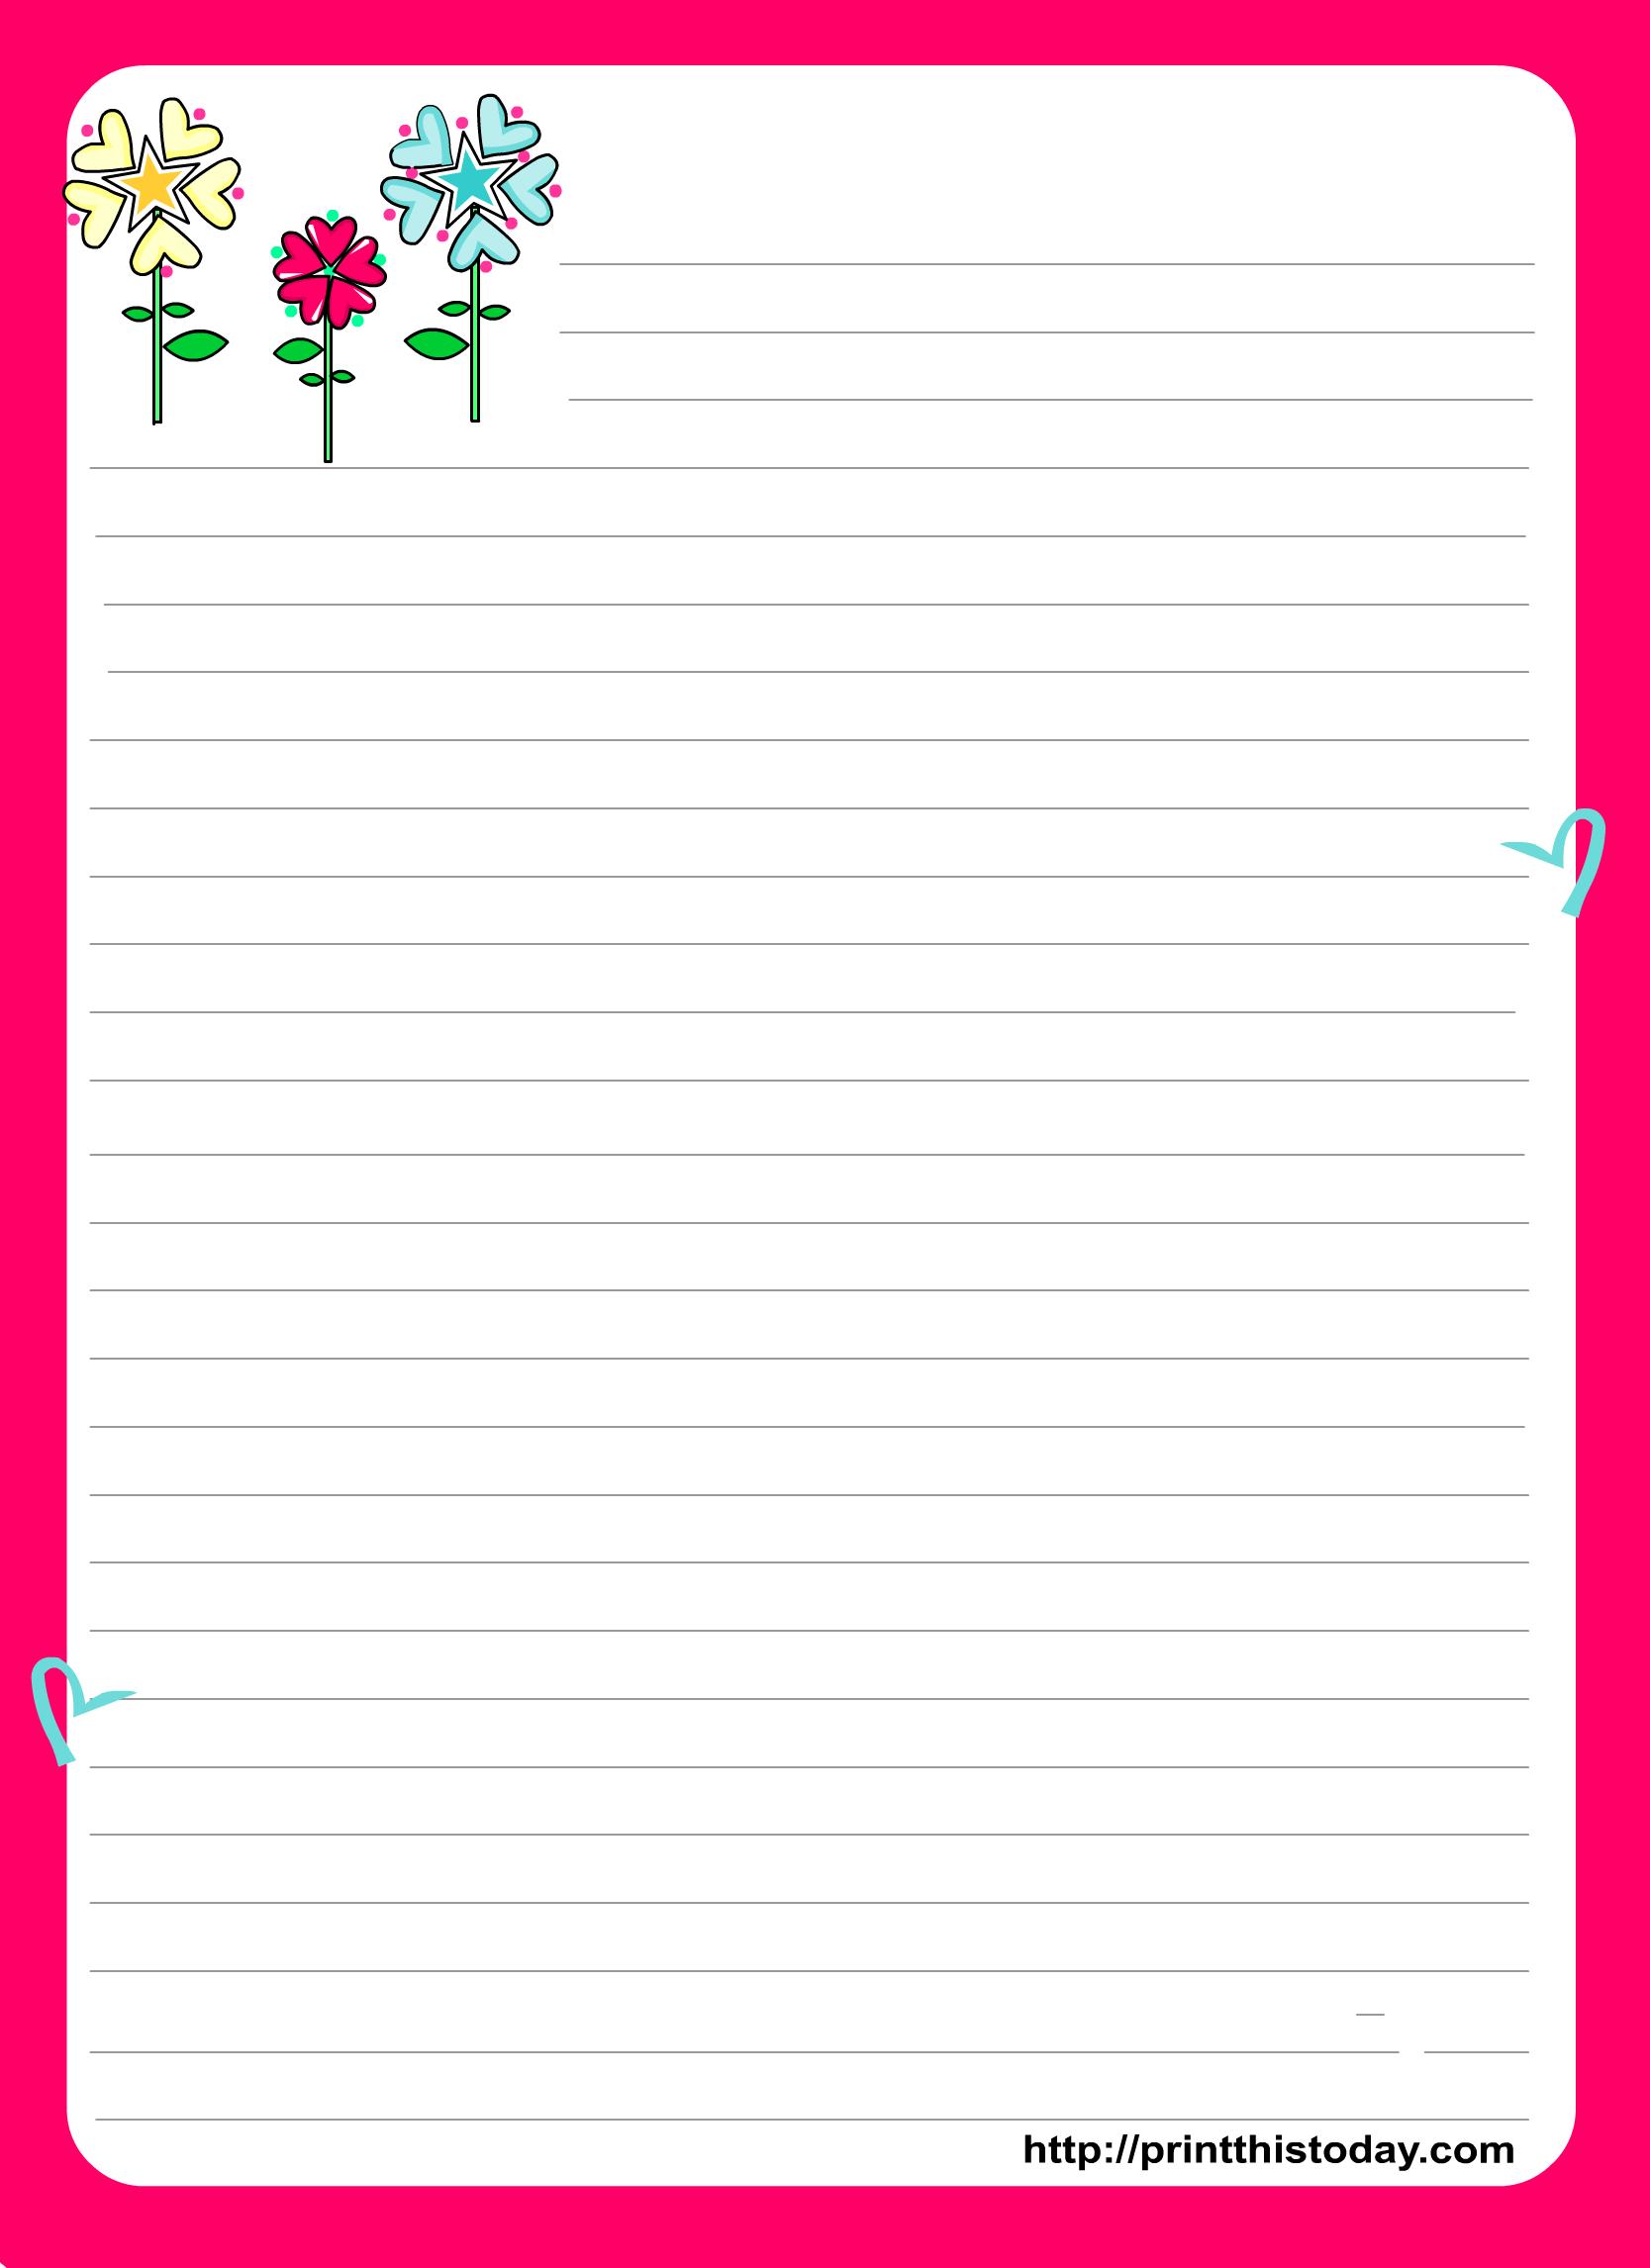 Love Letter Pad Stationery Stationery Stationery Free